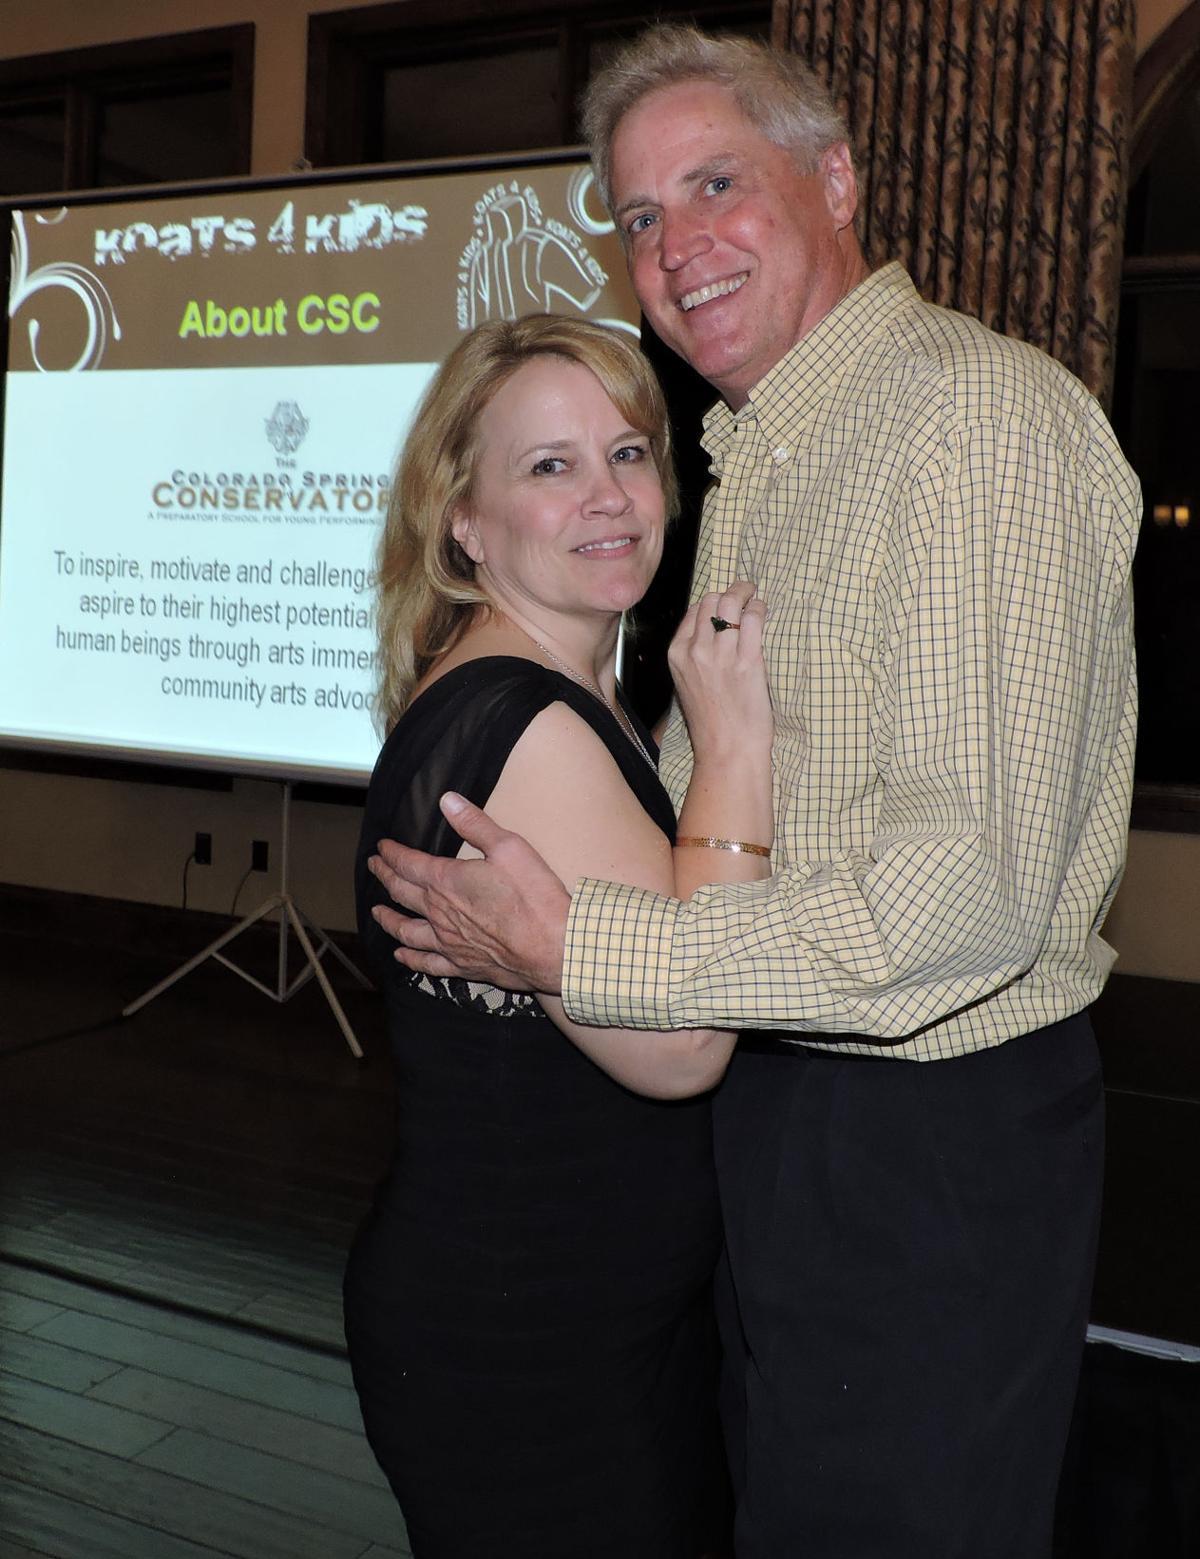 "Carol Raymond and Jay Brinkmeyer dance to the Conservatory's ""Its a Wonderful World"" at Koats 4 Kids. 102116 Photo by Linda Navarro"